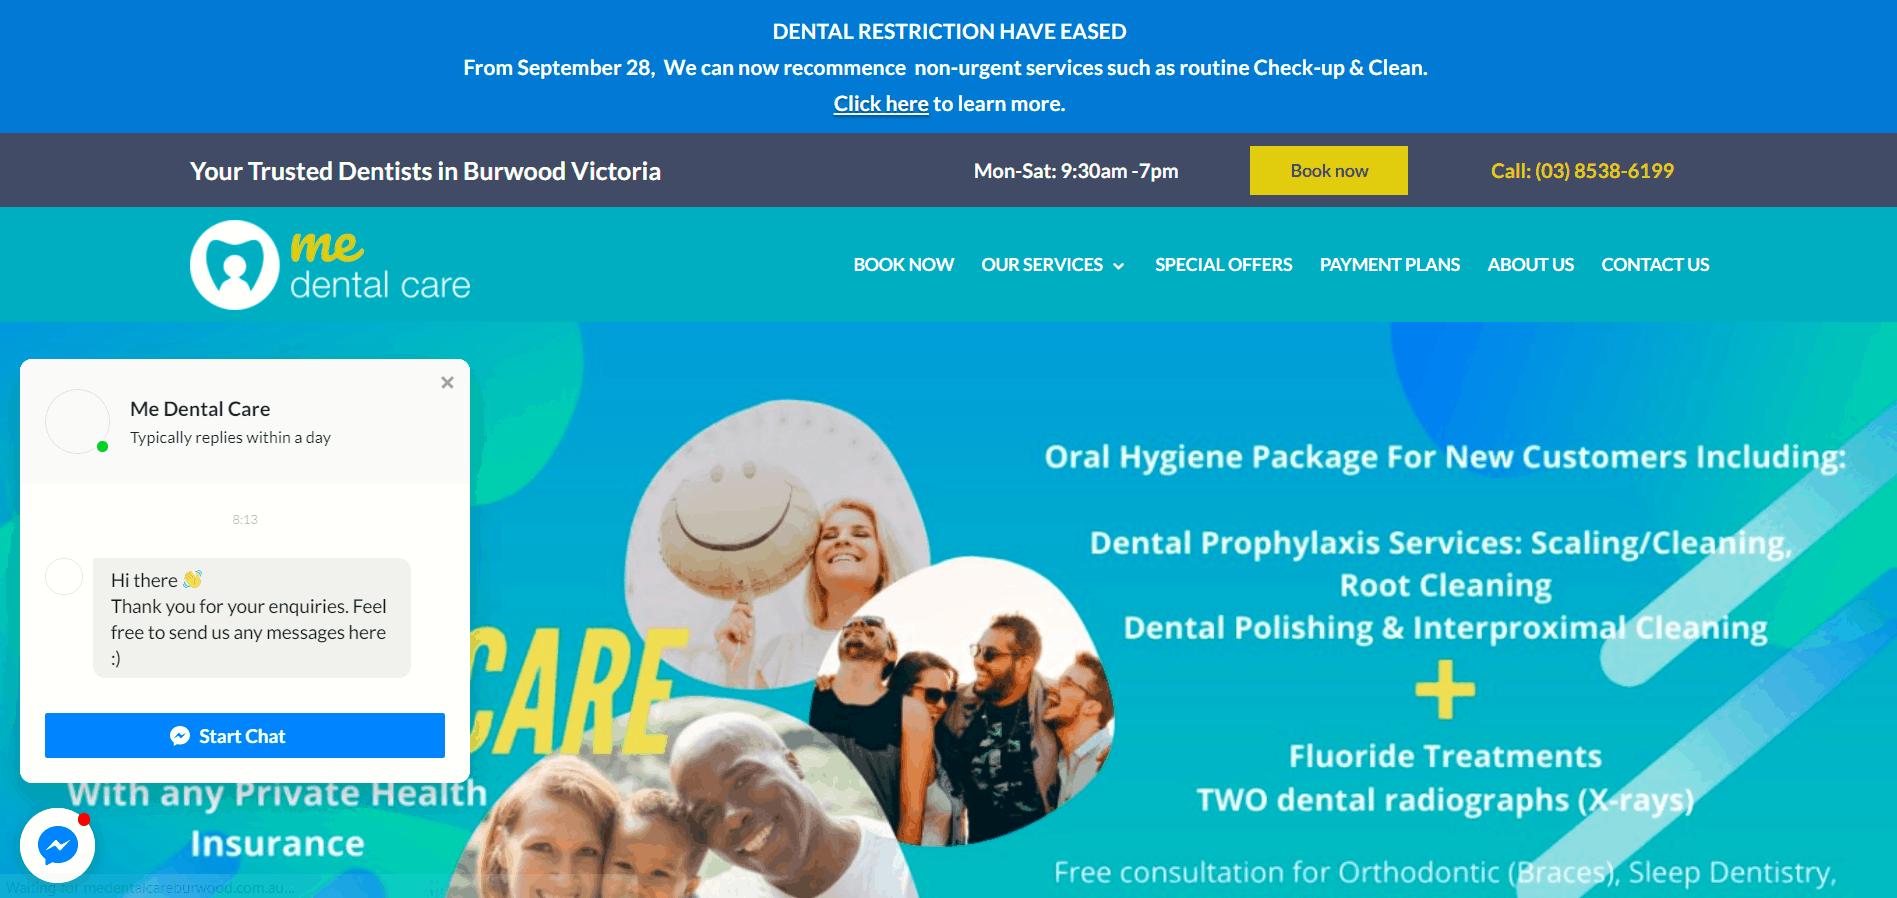 Me Dental Care